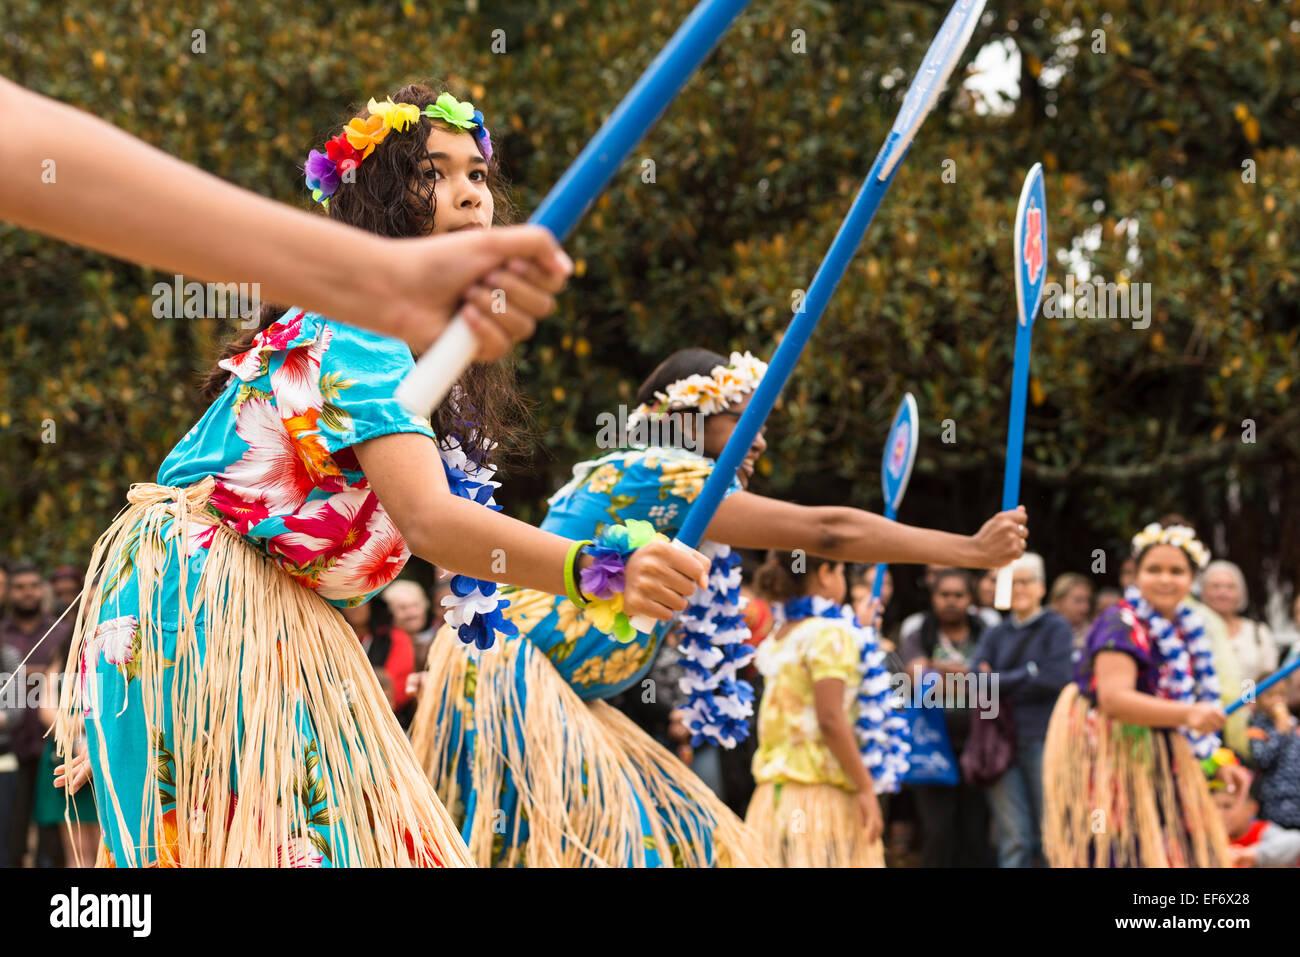 Urban Zendath Kes, a Sydney based Torres Strait Islander dance group performing in the rain, Yabun Festival Australia - Stock Image